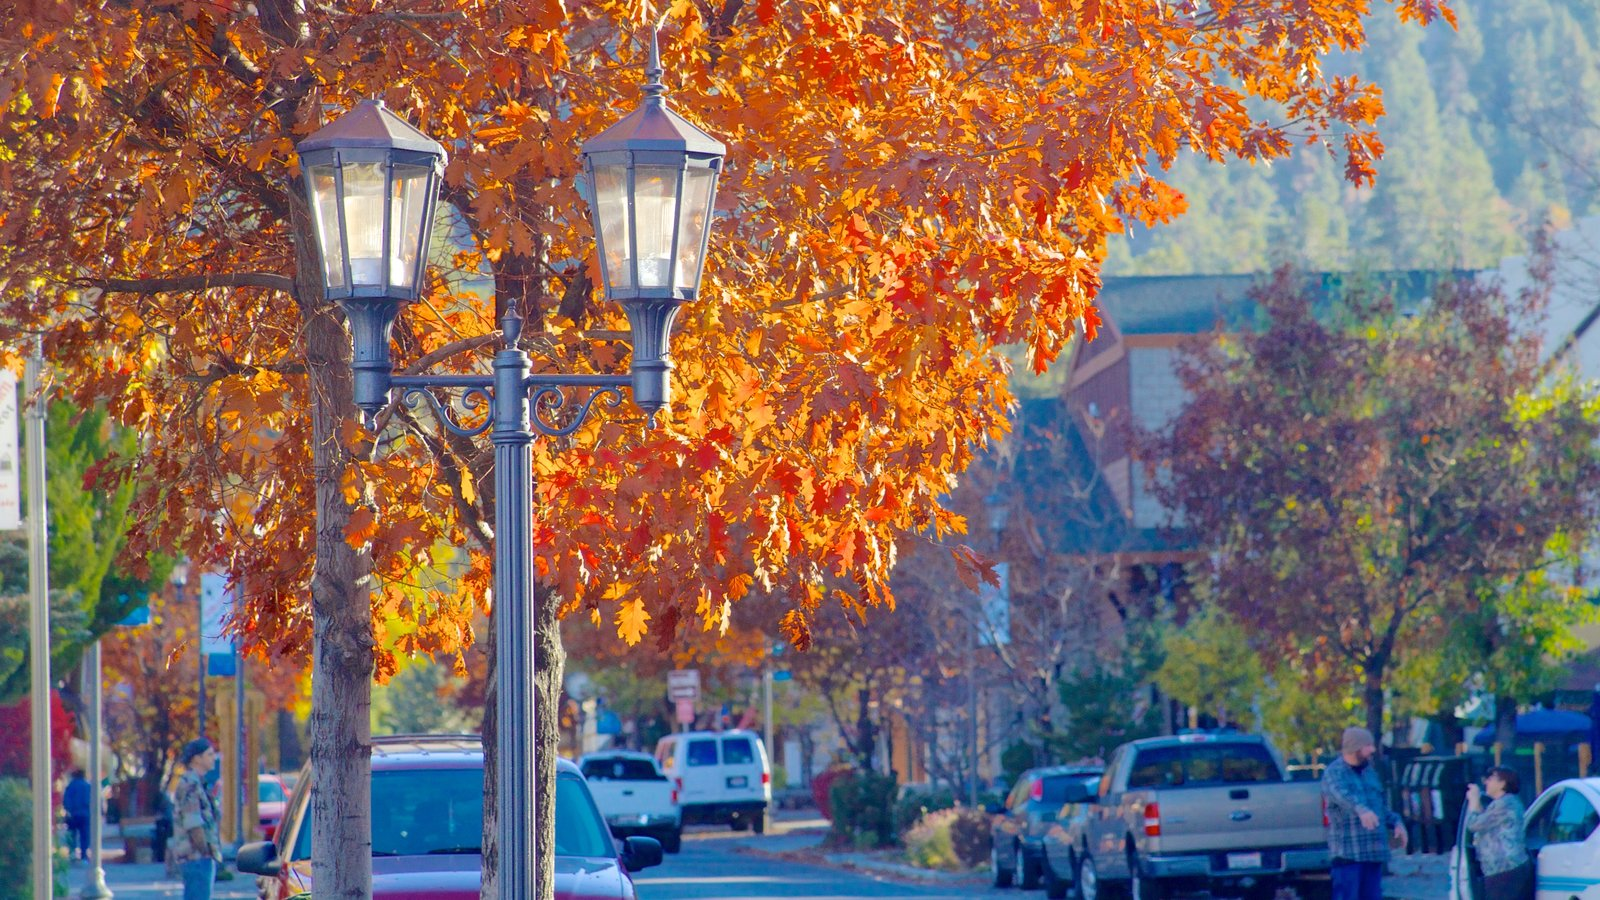 Big Bear Lake caracterizando cenas de rua e folhas de outono